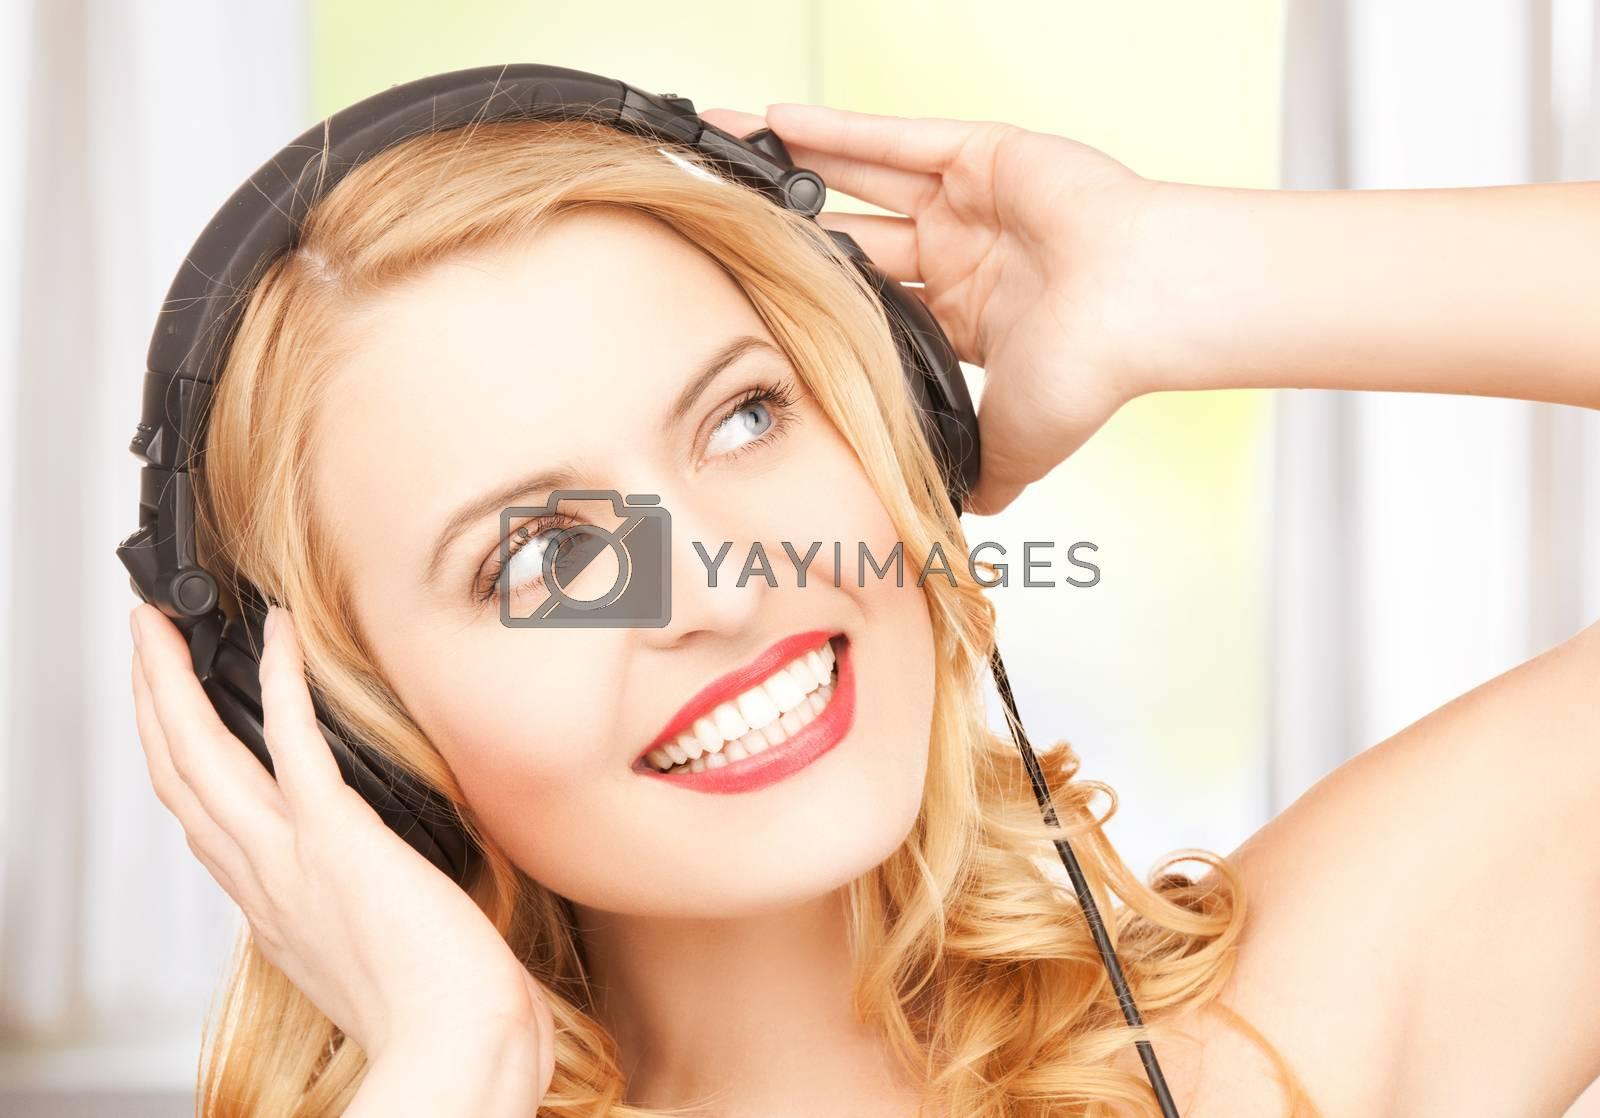 woman with headphones by dolgachov